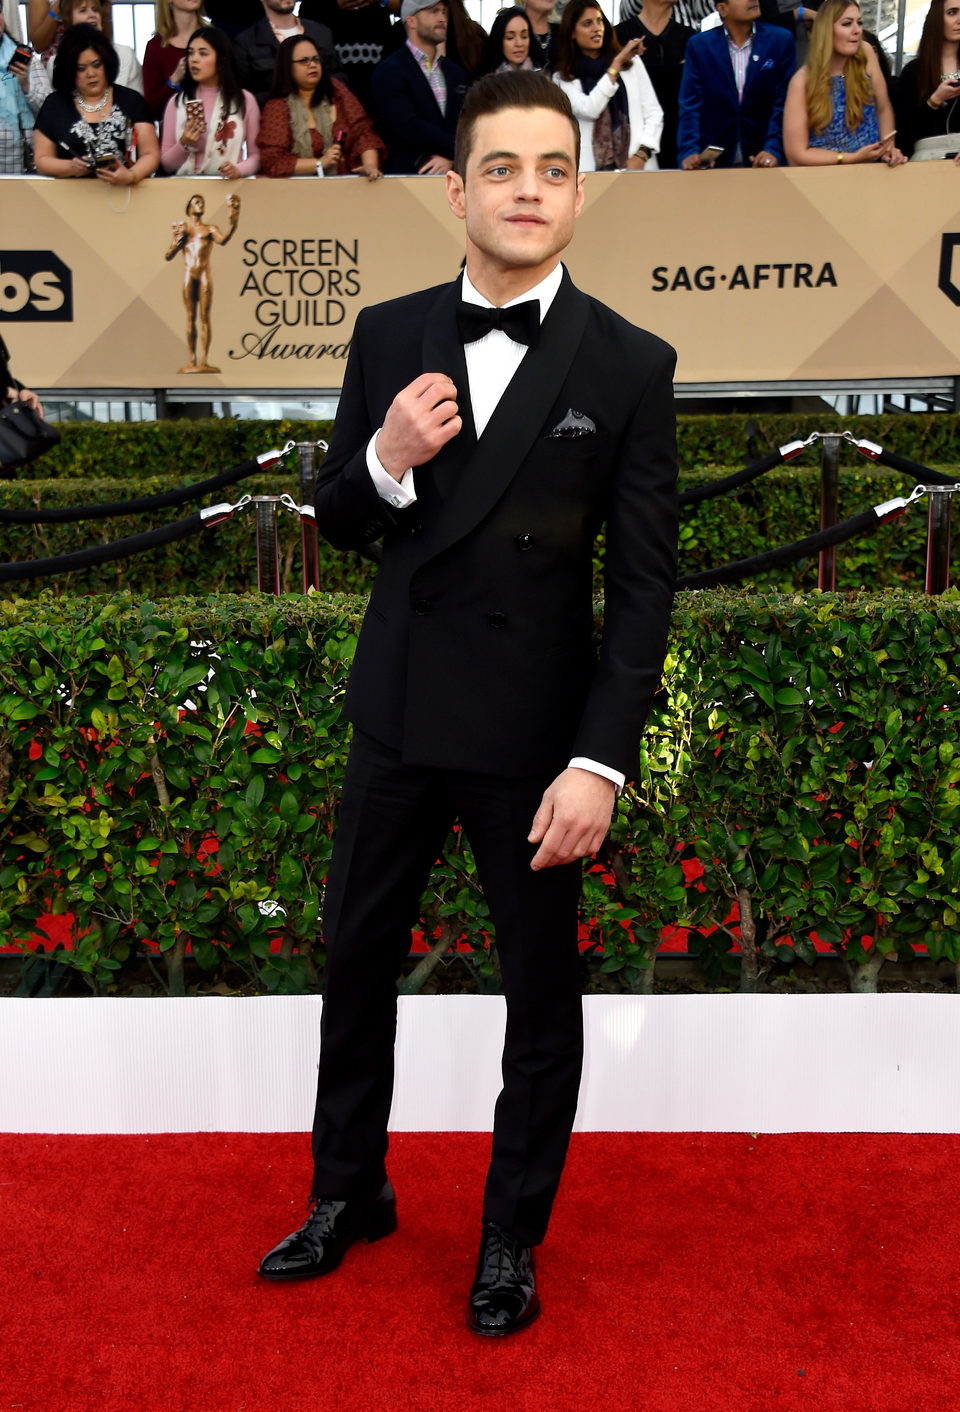 Rami Malek in red carpet of SAG Awards 2016